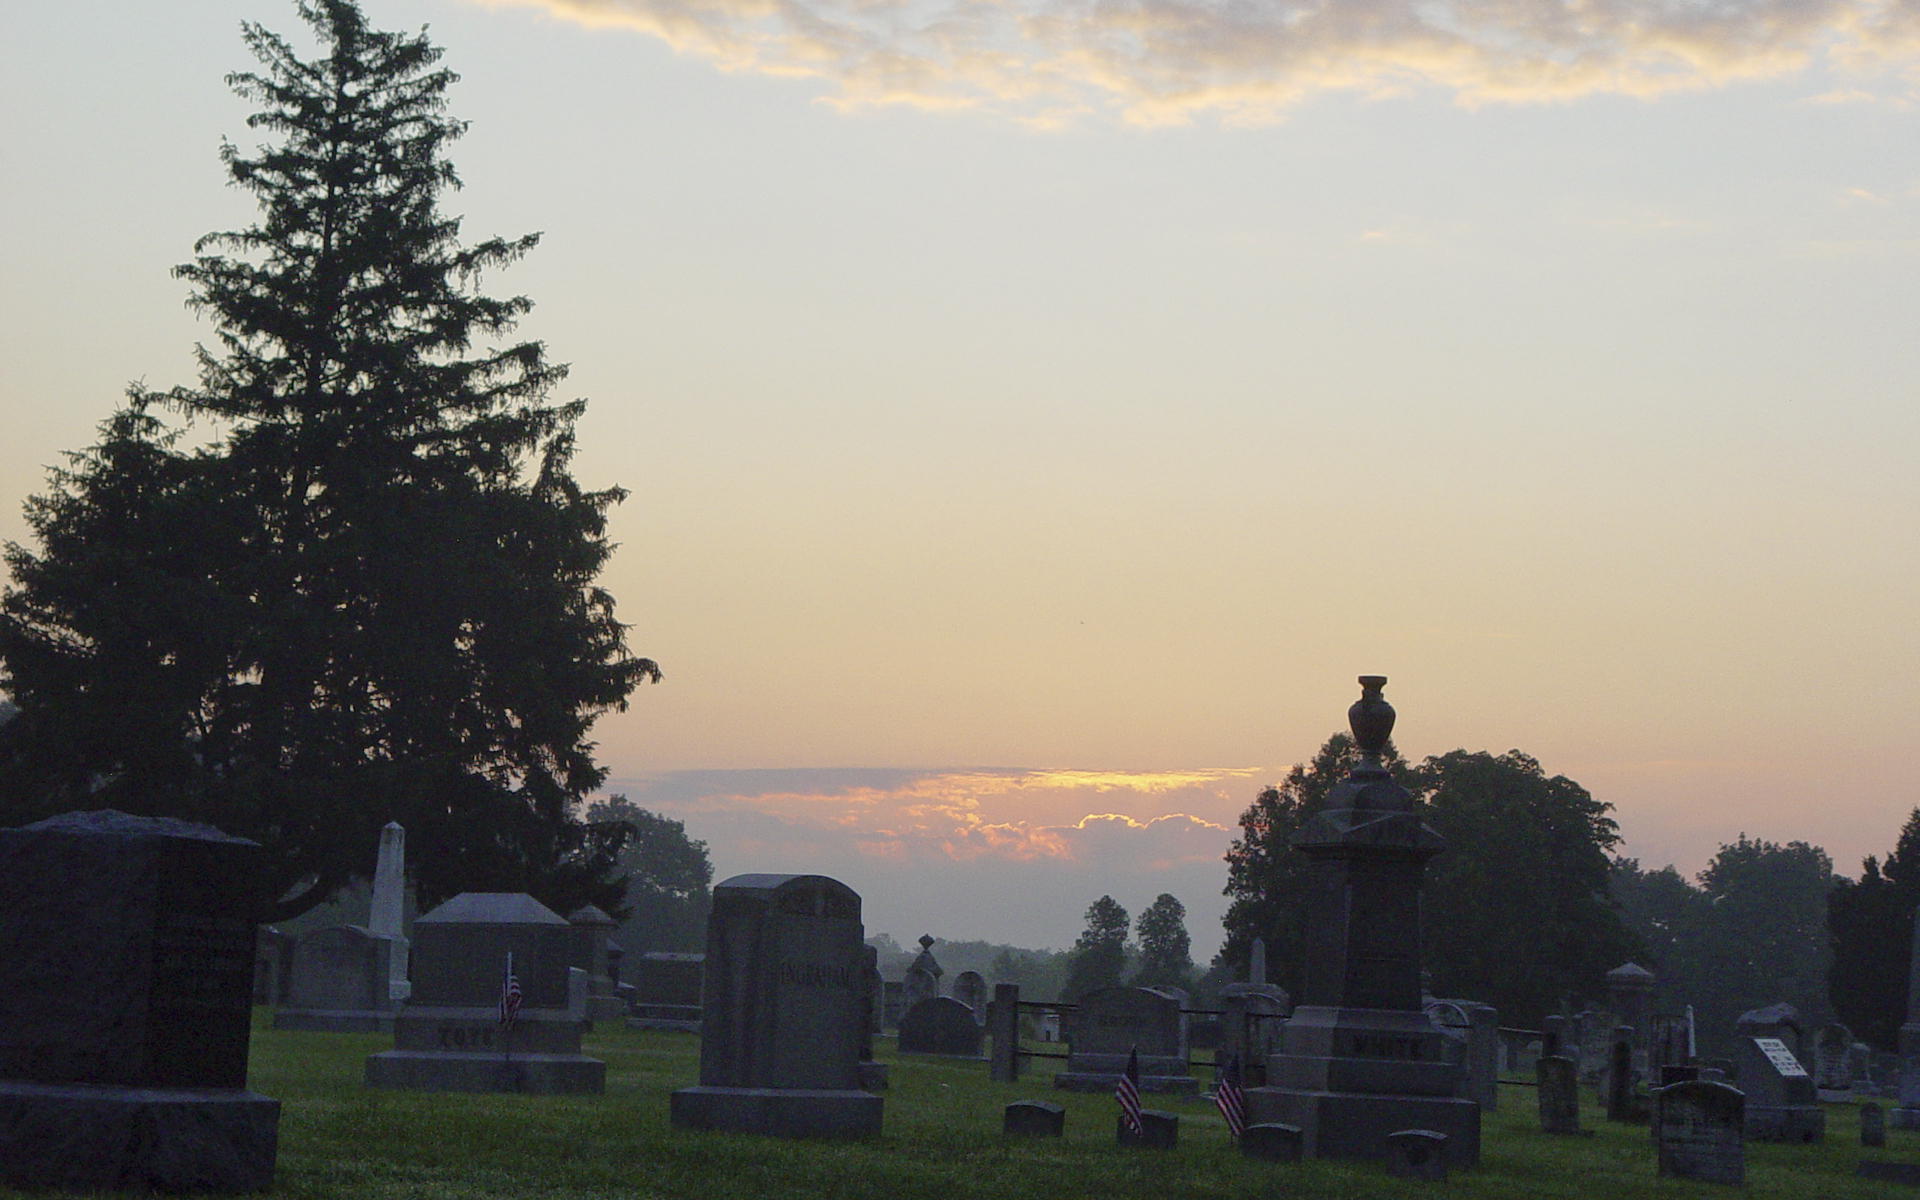 Sunrise, North Burial Ground, Bristol, RI (1920 x 1200 pixels)